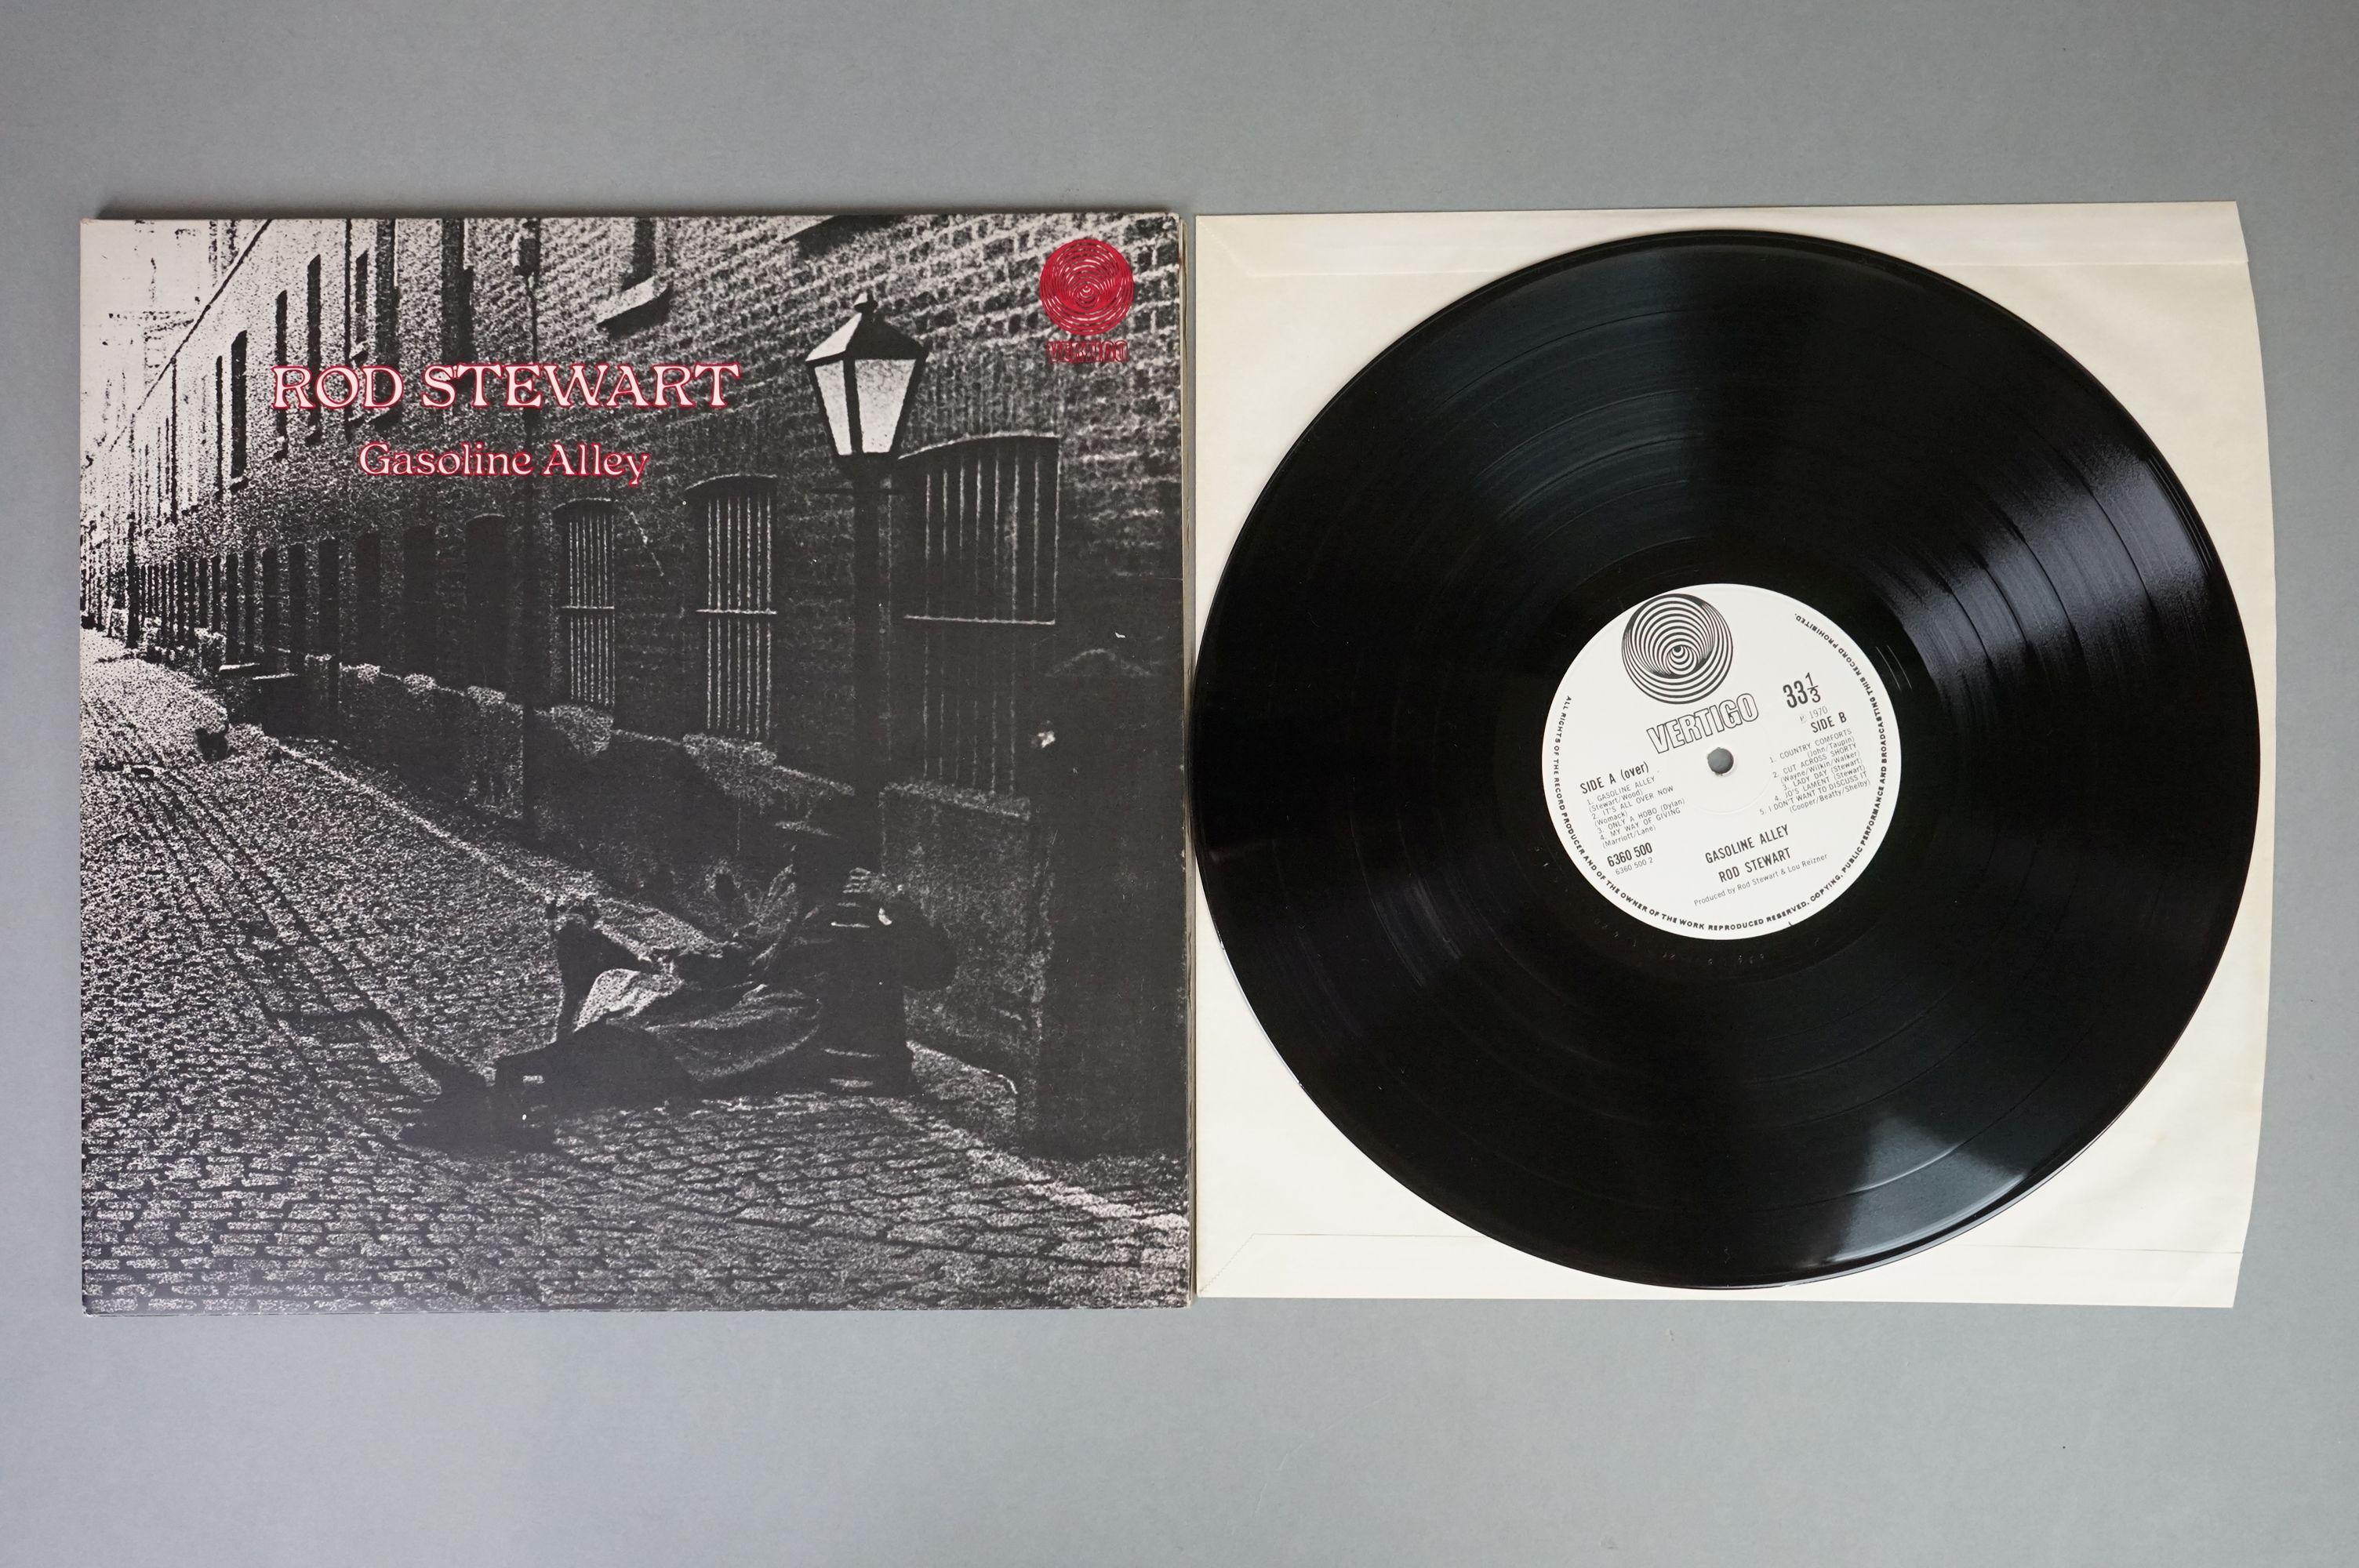 Vinyl - Rod Stewart 4 LP's to include An Old Raincoat Won't Ever Let You Down (Vertigo VO4) gatefold - Image 9 of 14